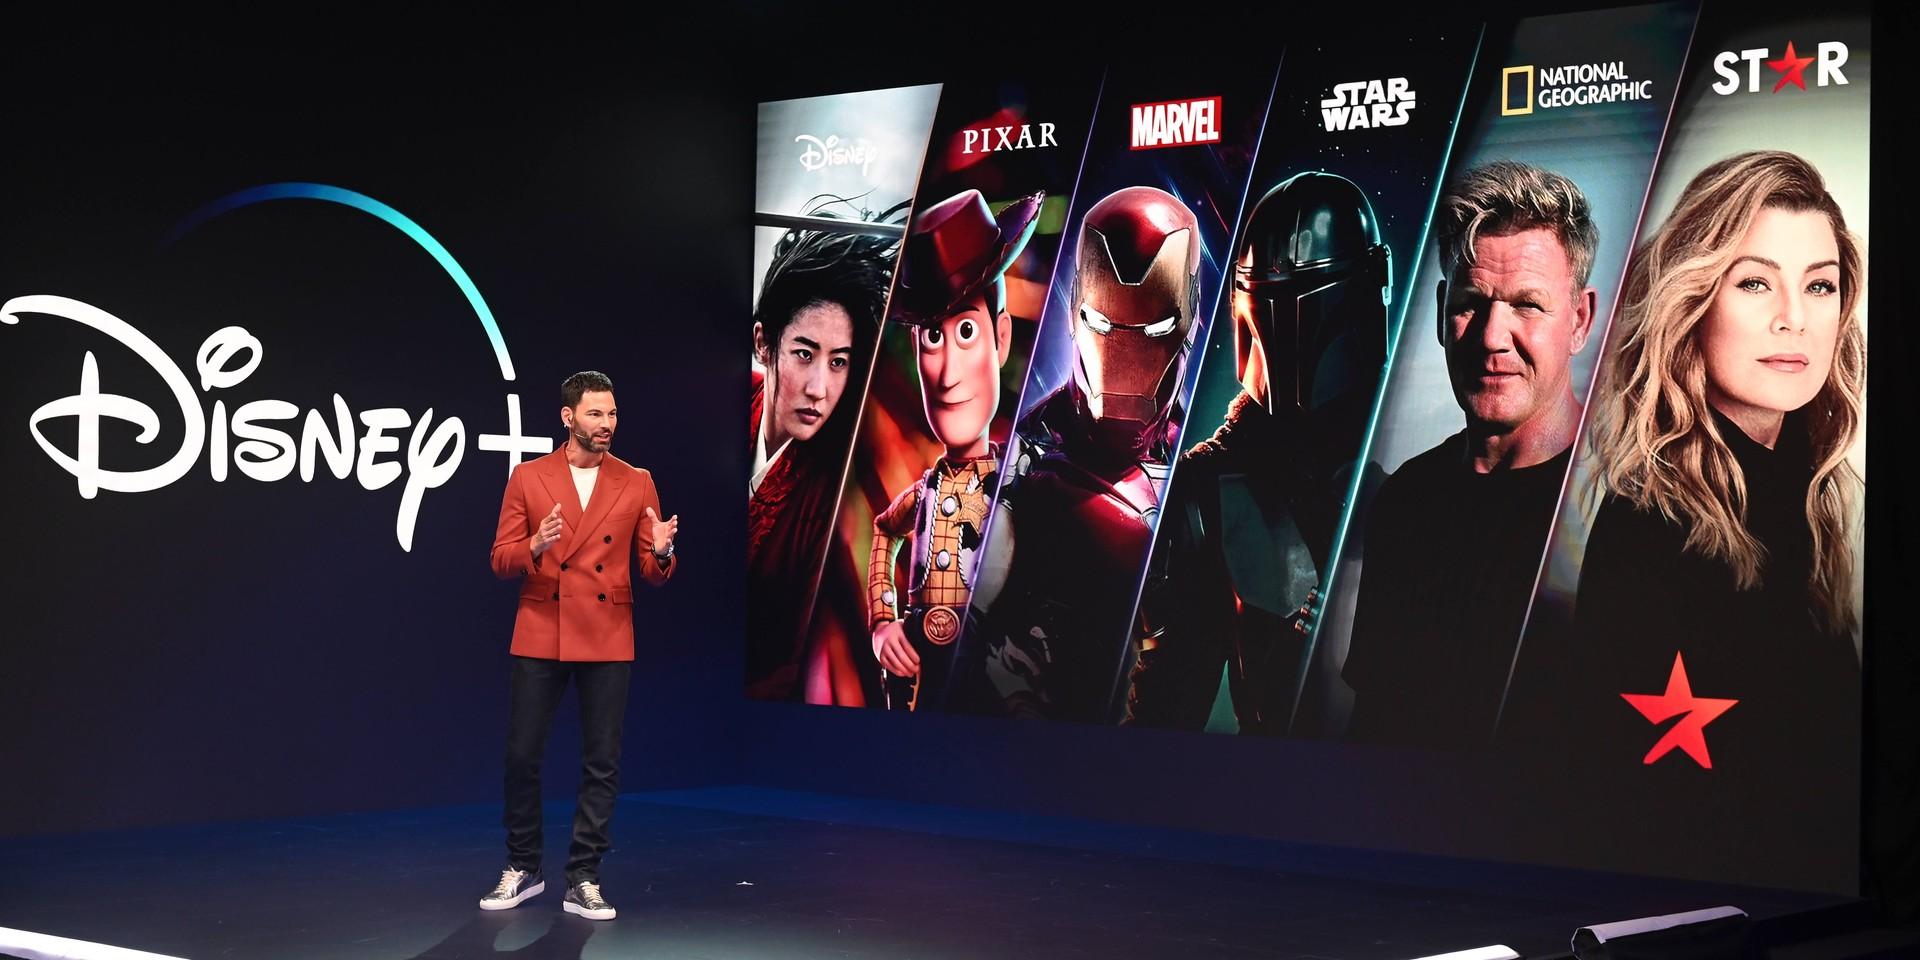 WandaVision, The Mandalorian, Loki, and more coming to Singapore on Disney+